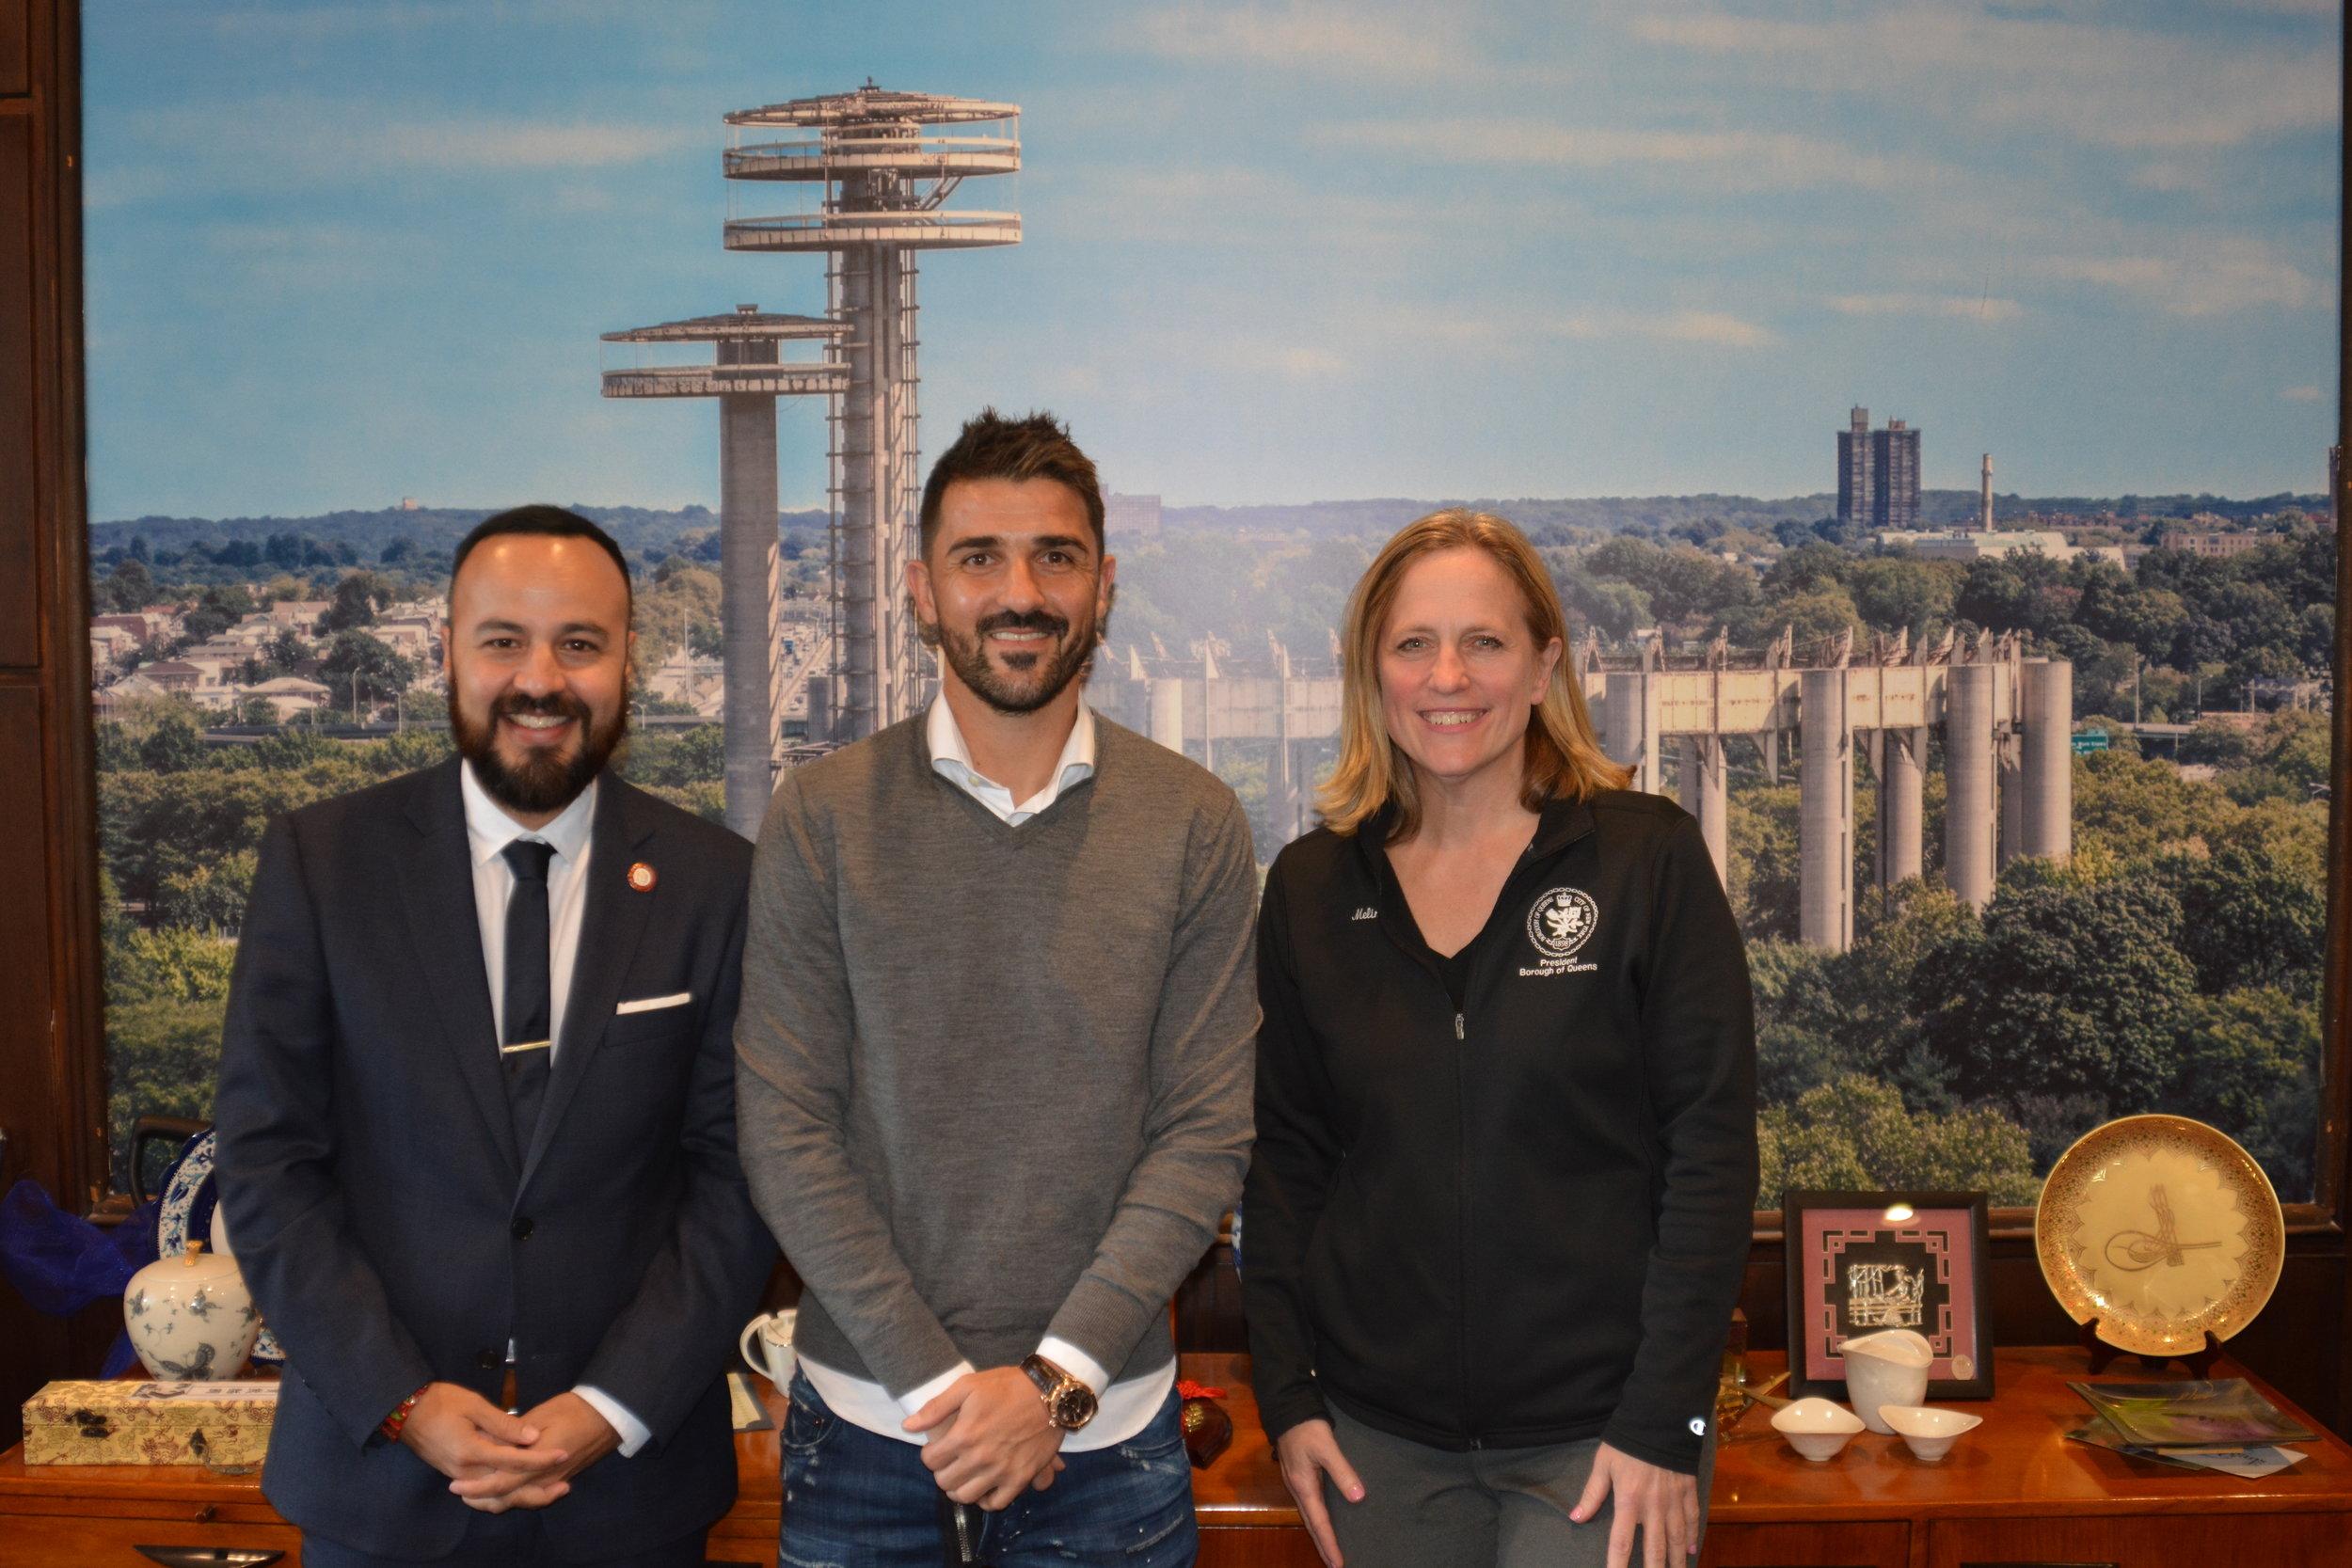 Councilmember Francisco Moya, David Villa and Borough President Melinda Katz. // Photo courtesy of Borough Hall